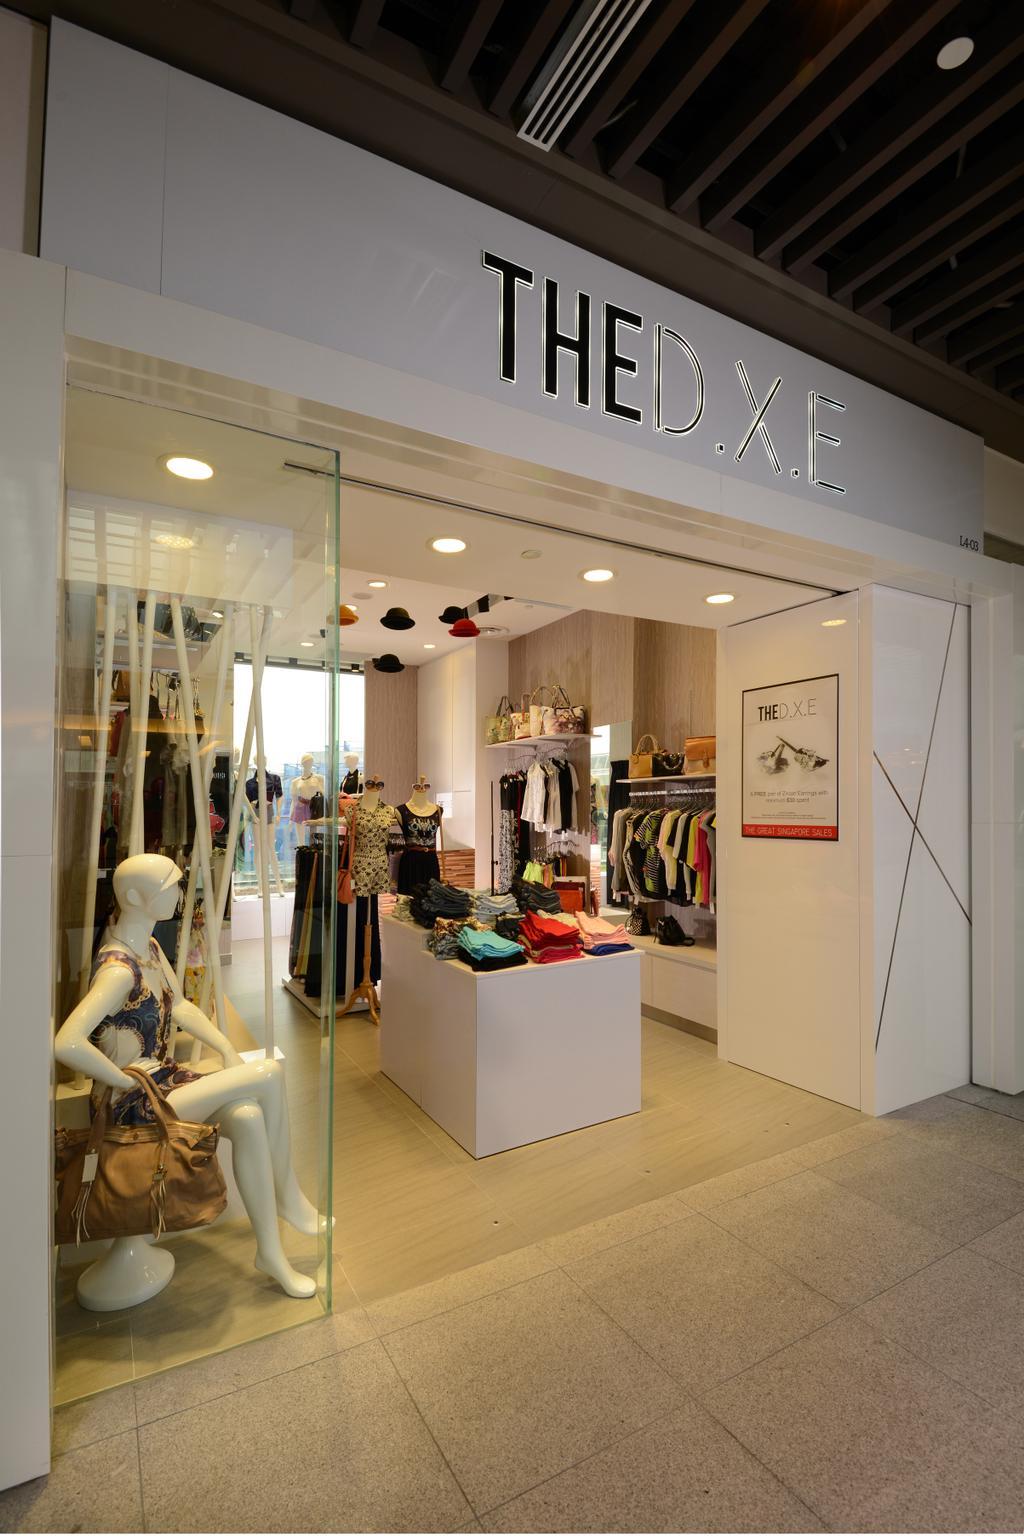 The D.X.E, Commercial, Interior Designer, Urban Habitat Design, Modern, Human, People, Person, Mannequin, Shop, Boutique